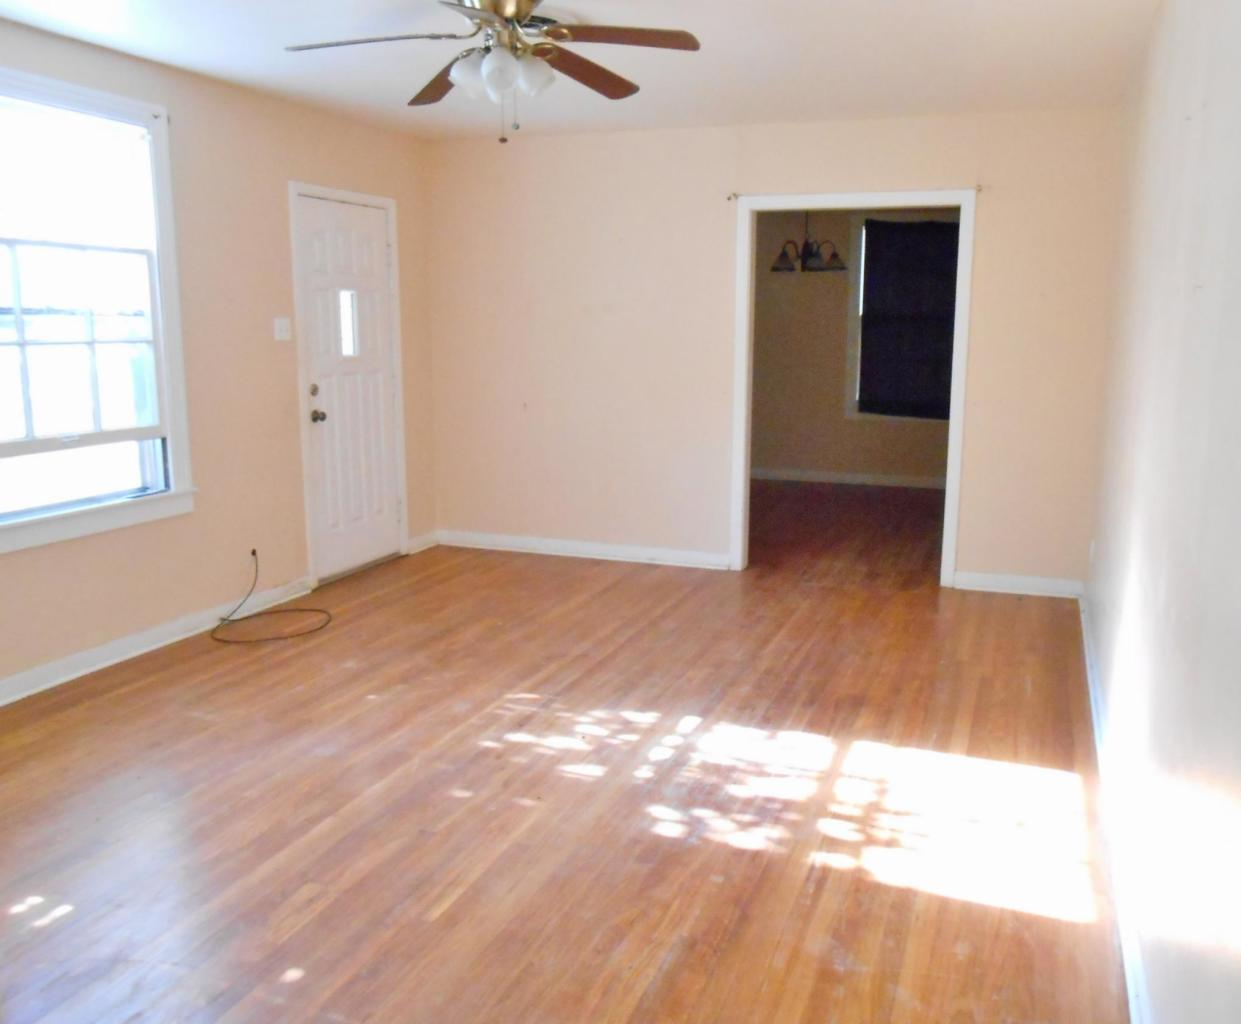 Leesville home for sale, 1107 John Paul Jones, Leesville LA - $69,500